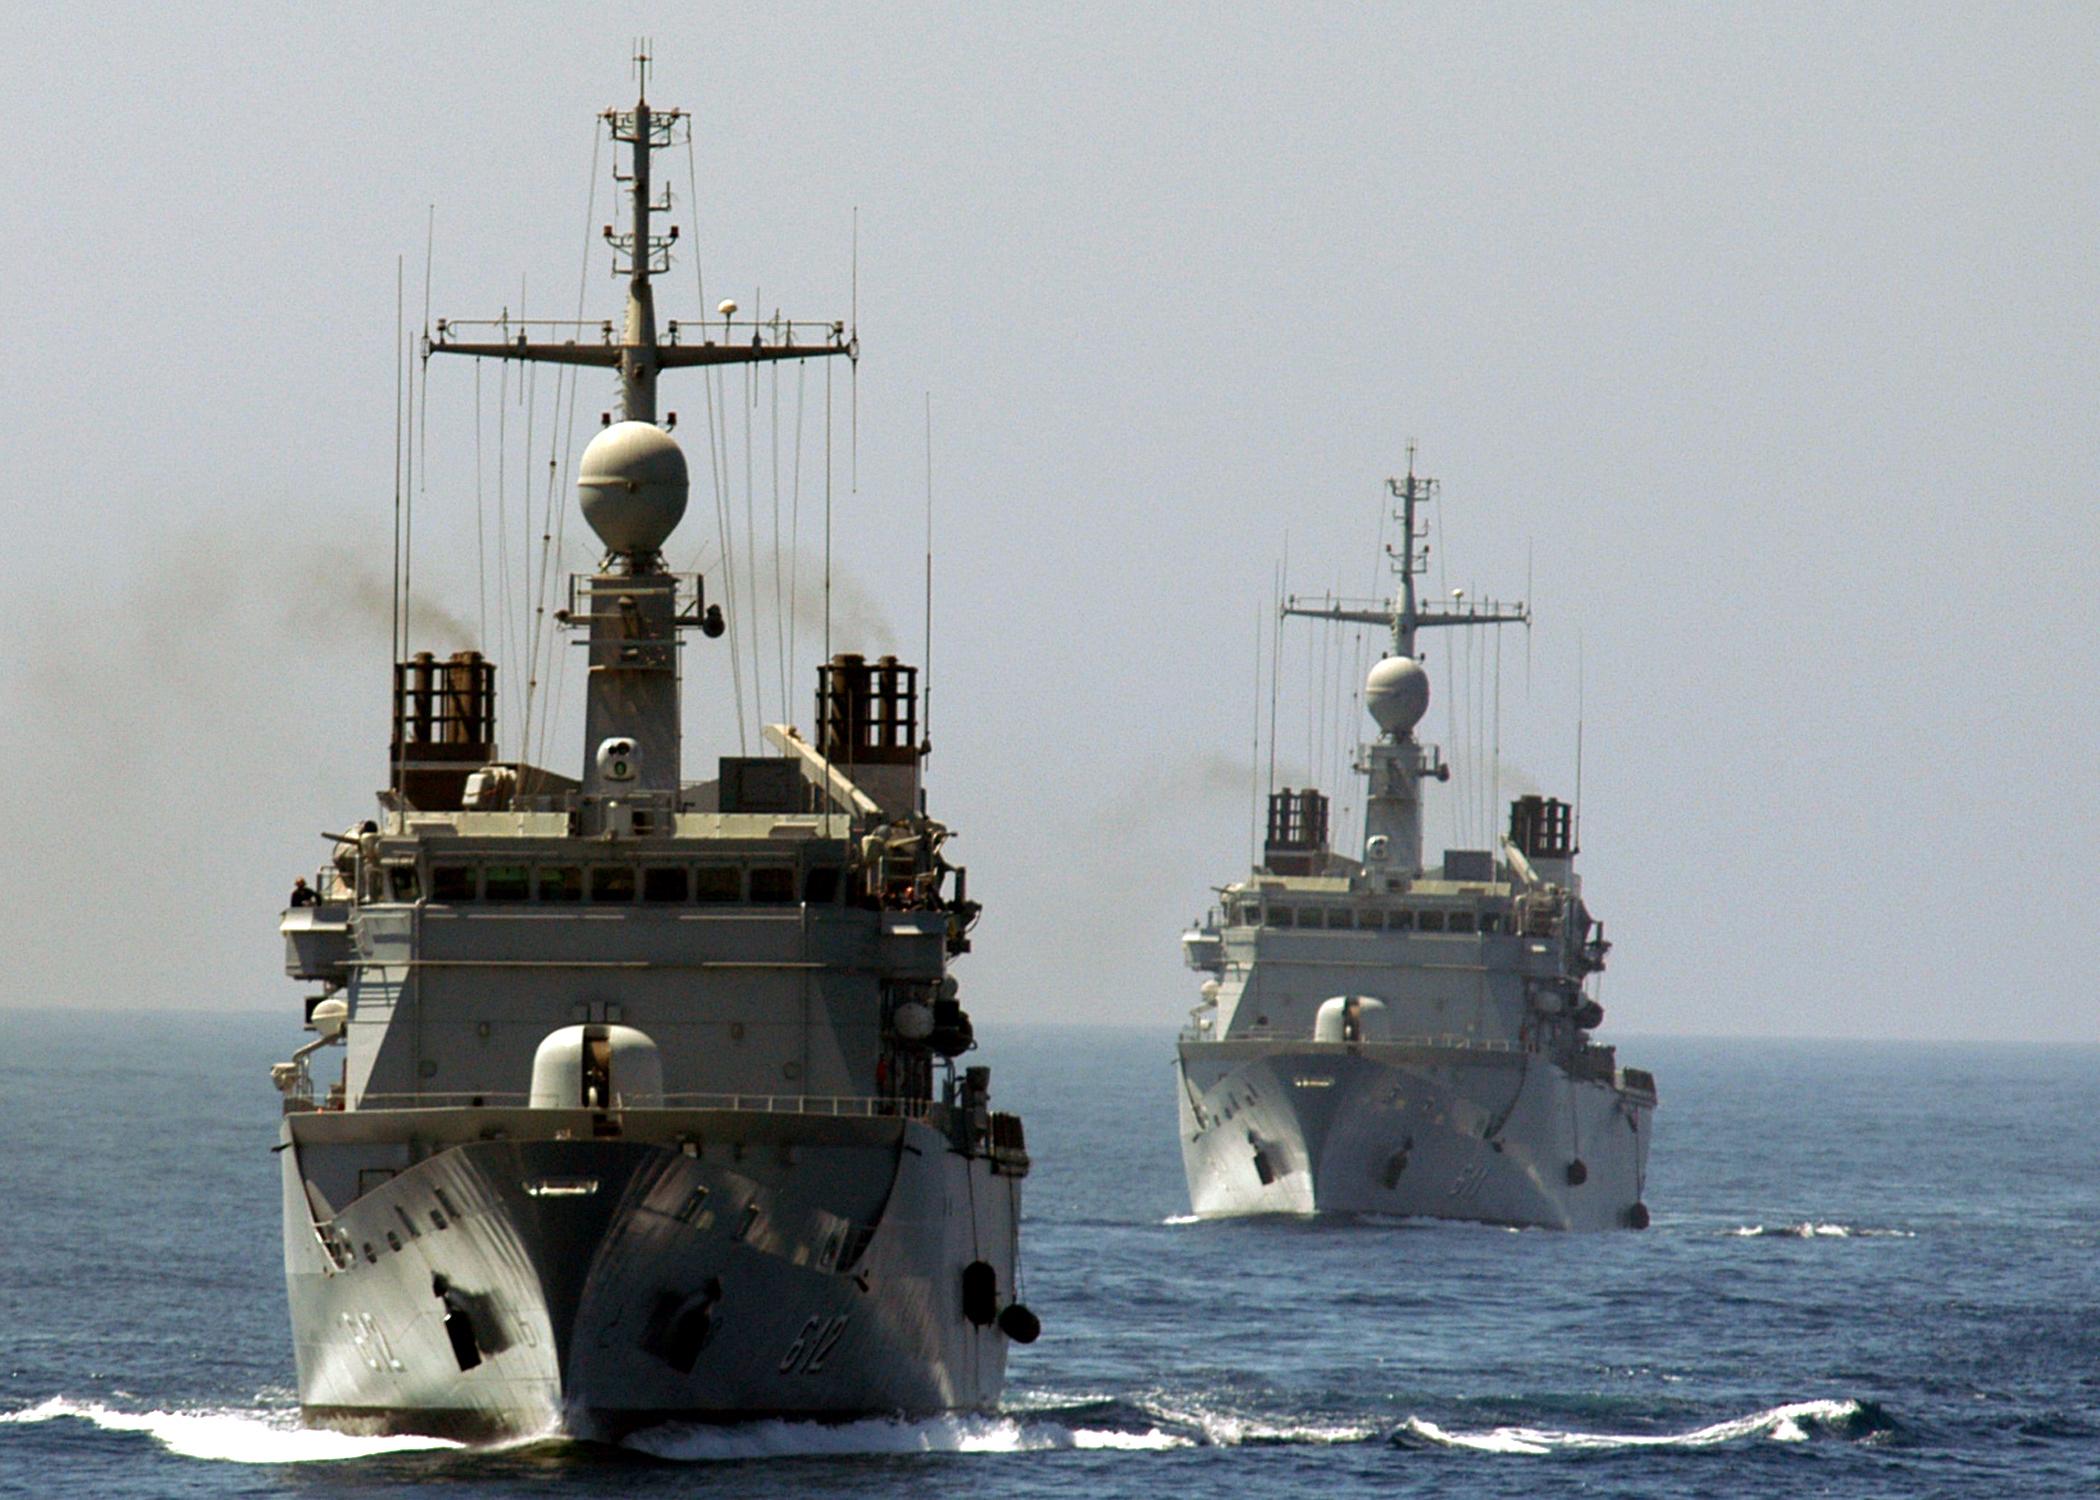 فرقاطة فلوريال المغربية...من فرقاطة دورية اعالي البحار...الى فرقاطة قتالية US_Navy_050405-N-3557N-112_The_Moroccan_Navy_Floreal-class_frigates%2C_Muhammed_V_%28FFGHM_611%29_and_Hassan_II_%28FFGHM_612%29_conduct_maneuvers_with_the_ships_assigned_to_the_USS_Kearsarge_%28LHD_3%29_Expeditionary_Strike_Group